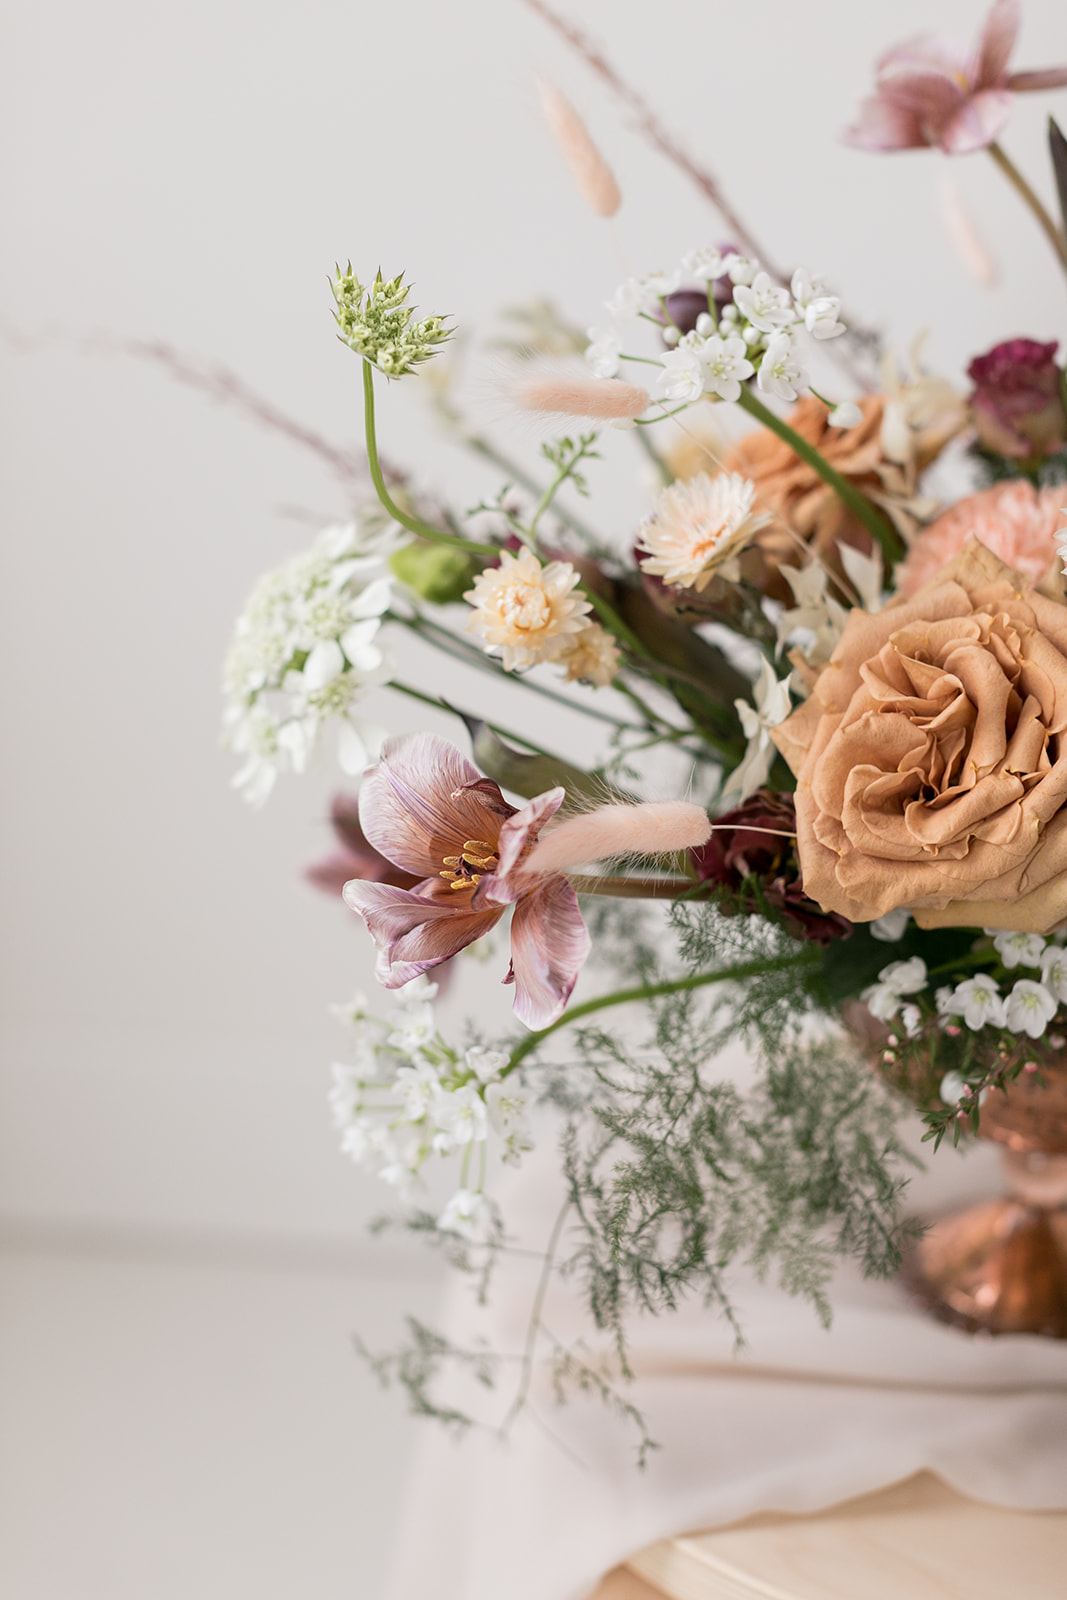 Presses Flowers Styled Shoot - Amy Caroline Photography-140.jpg